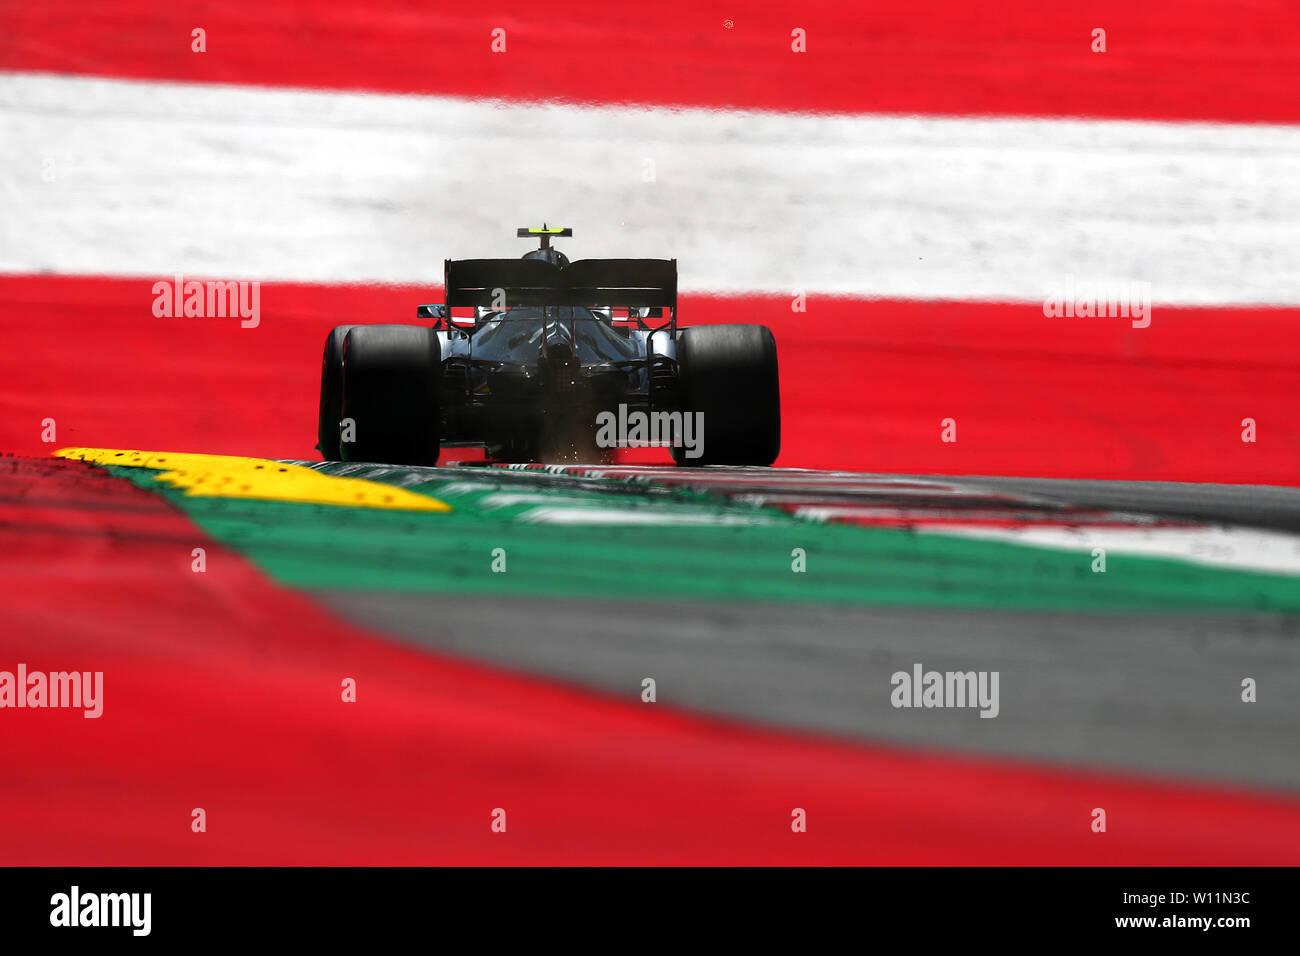 #44 Lewis Hamilton Mercedes AMG Team F1. Austrian Grand Prix 2019 Spielberg. Zeltweg 29/06/2019 GP Austria Formula 1 Championship 2019 Race Photo Federico Basile/Insidefoto Credit: insidefoto srl/Alamy Live News Stock Photo